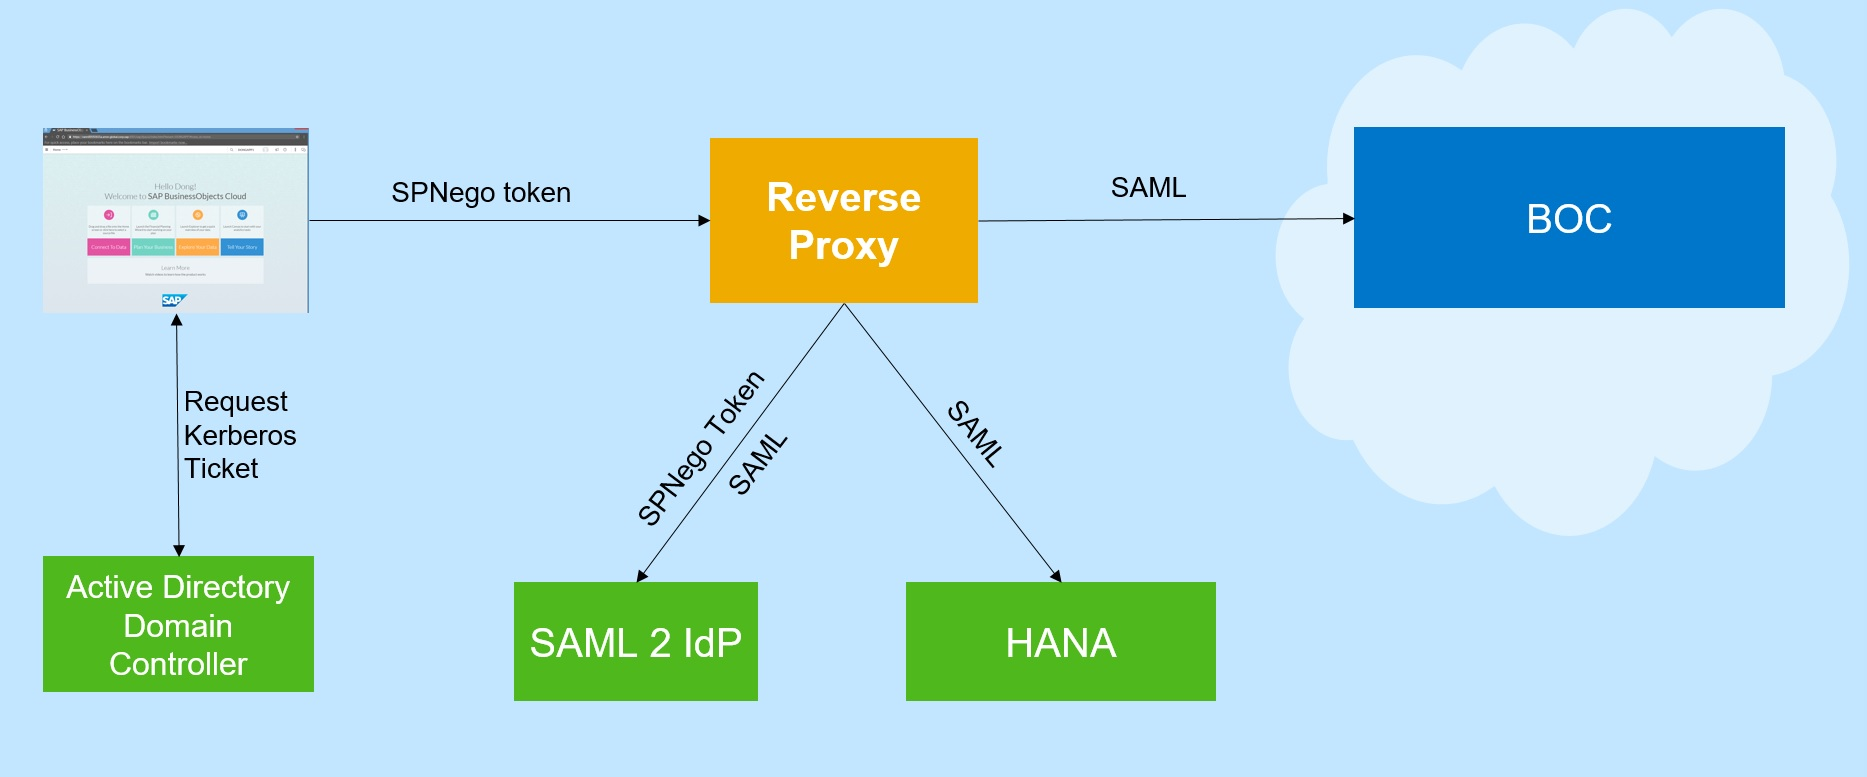 sap how to create a domain